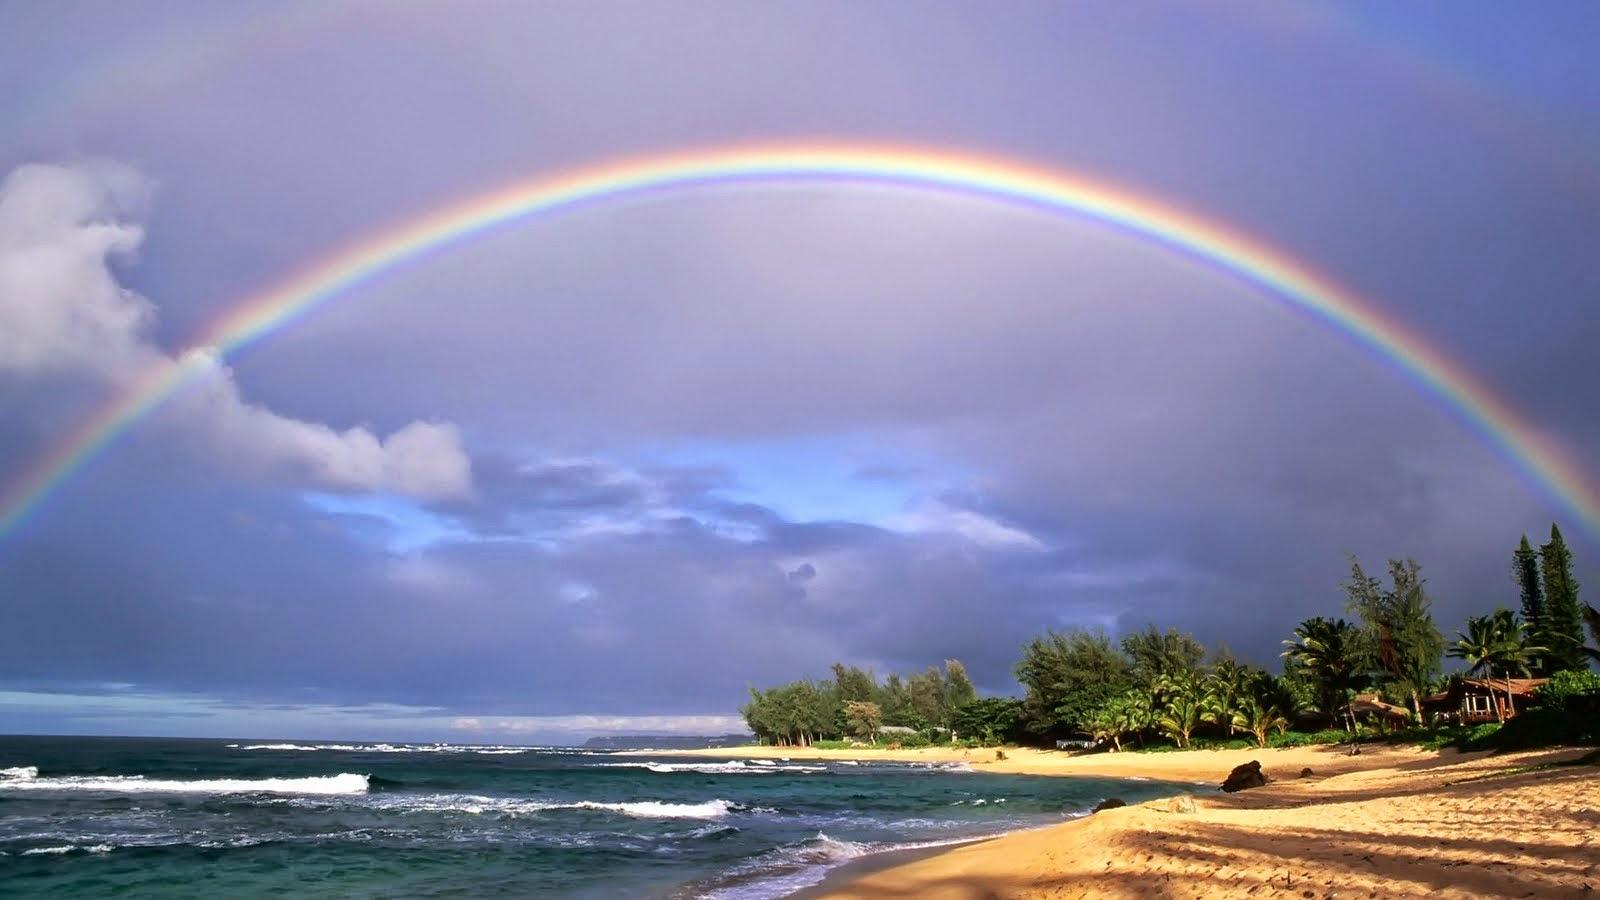 rainbows pictures